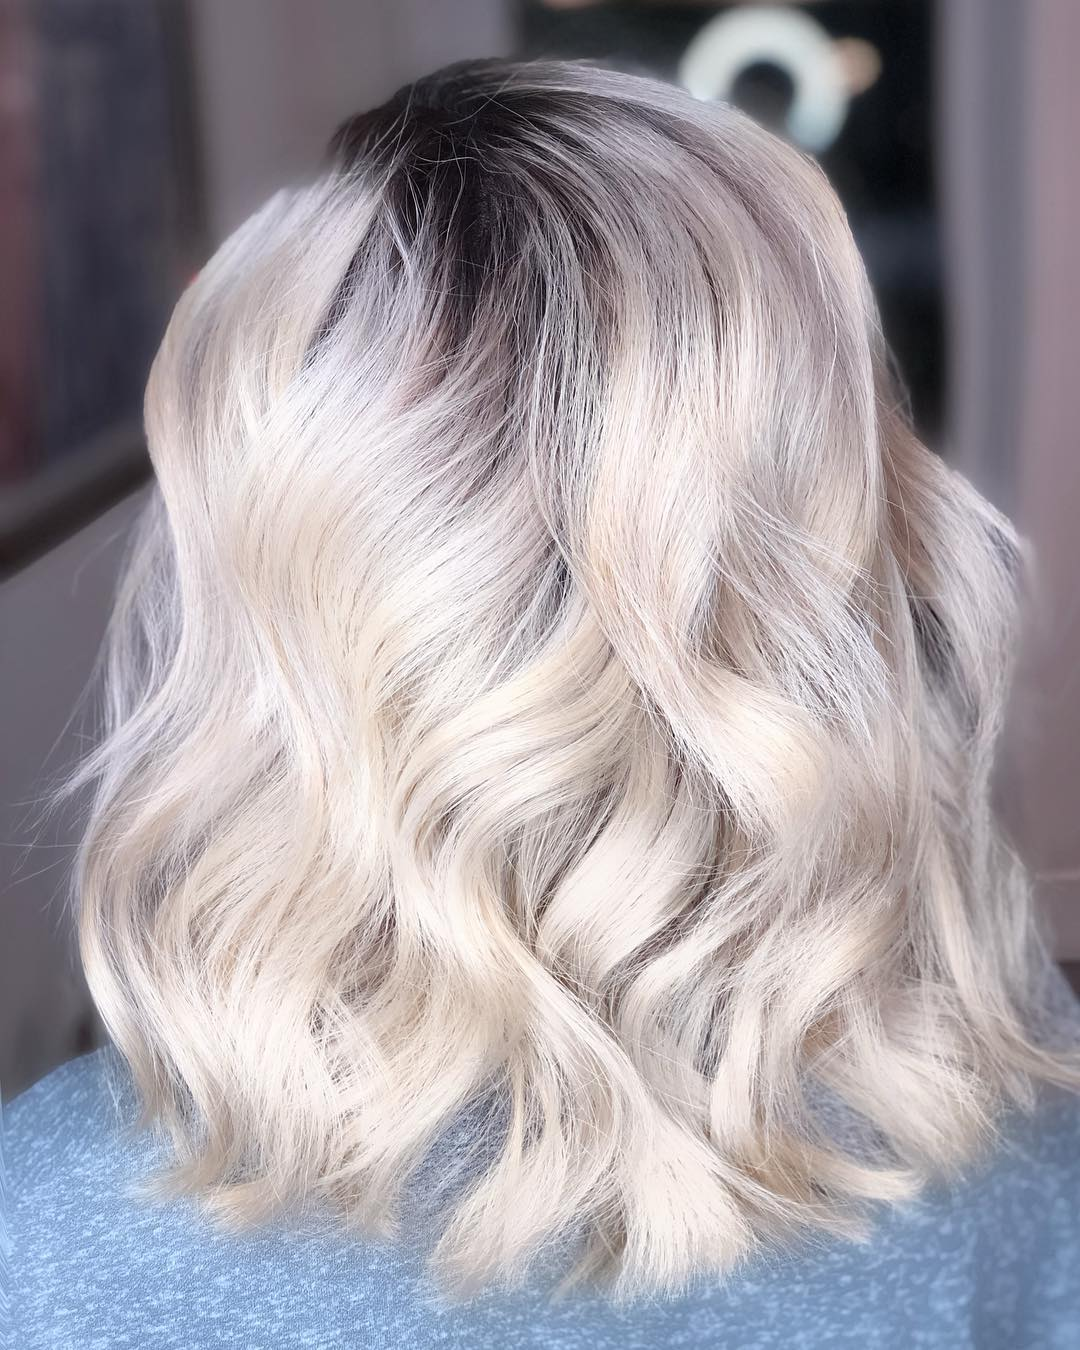 capelli biondi bianchi